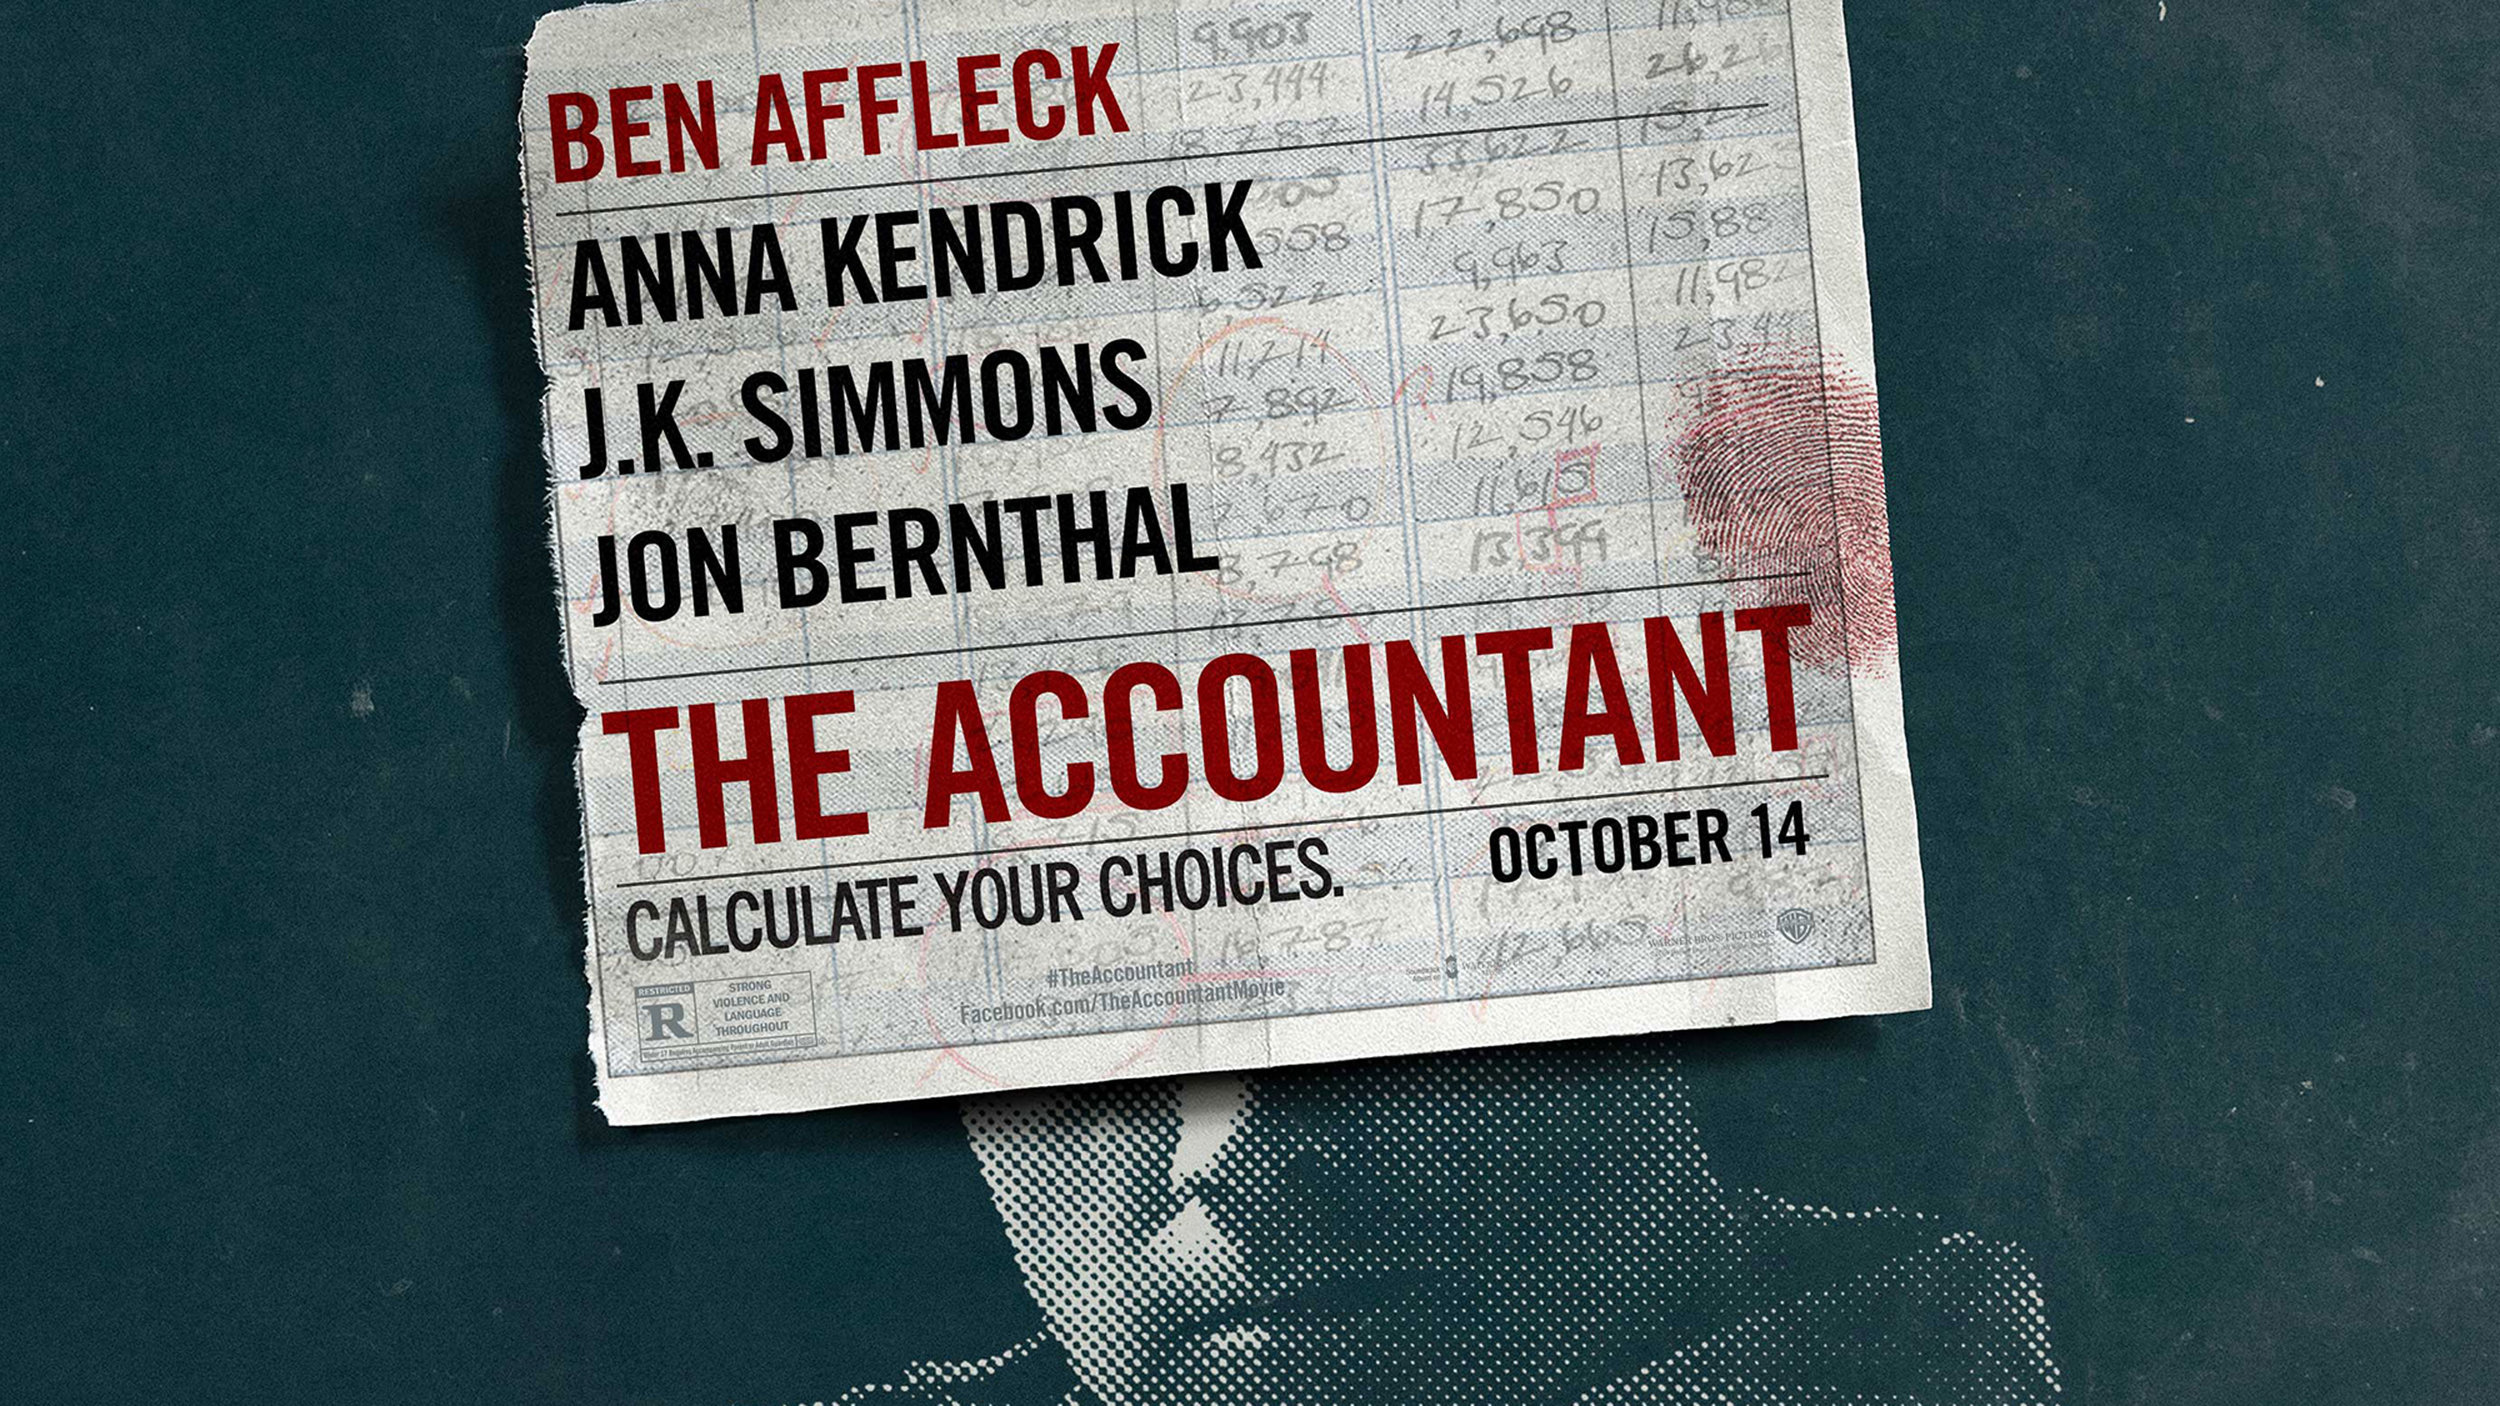 the-accountant-banner-2.jpg